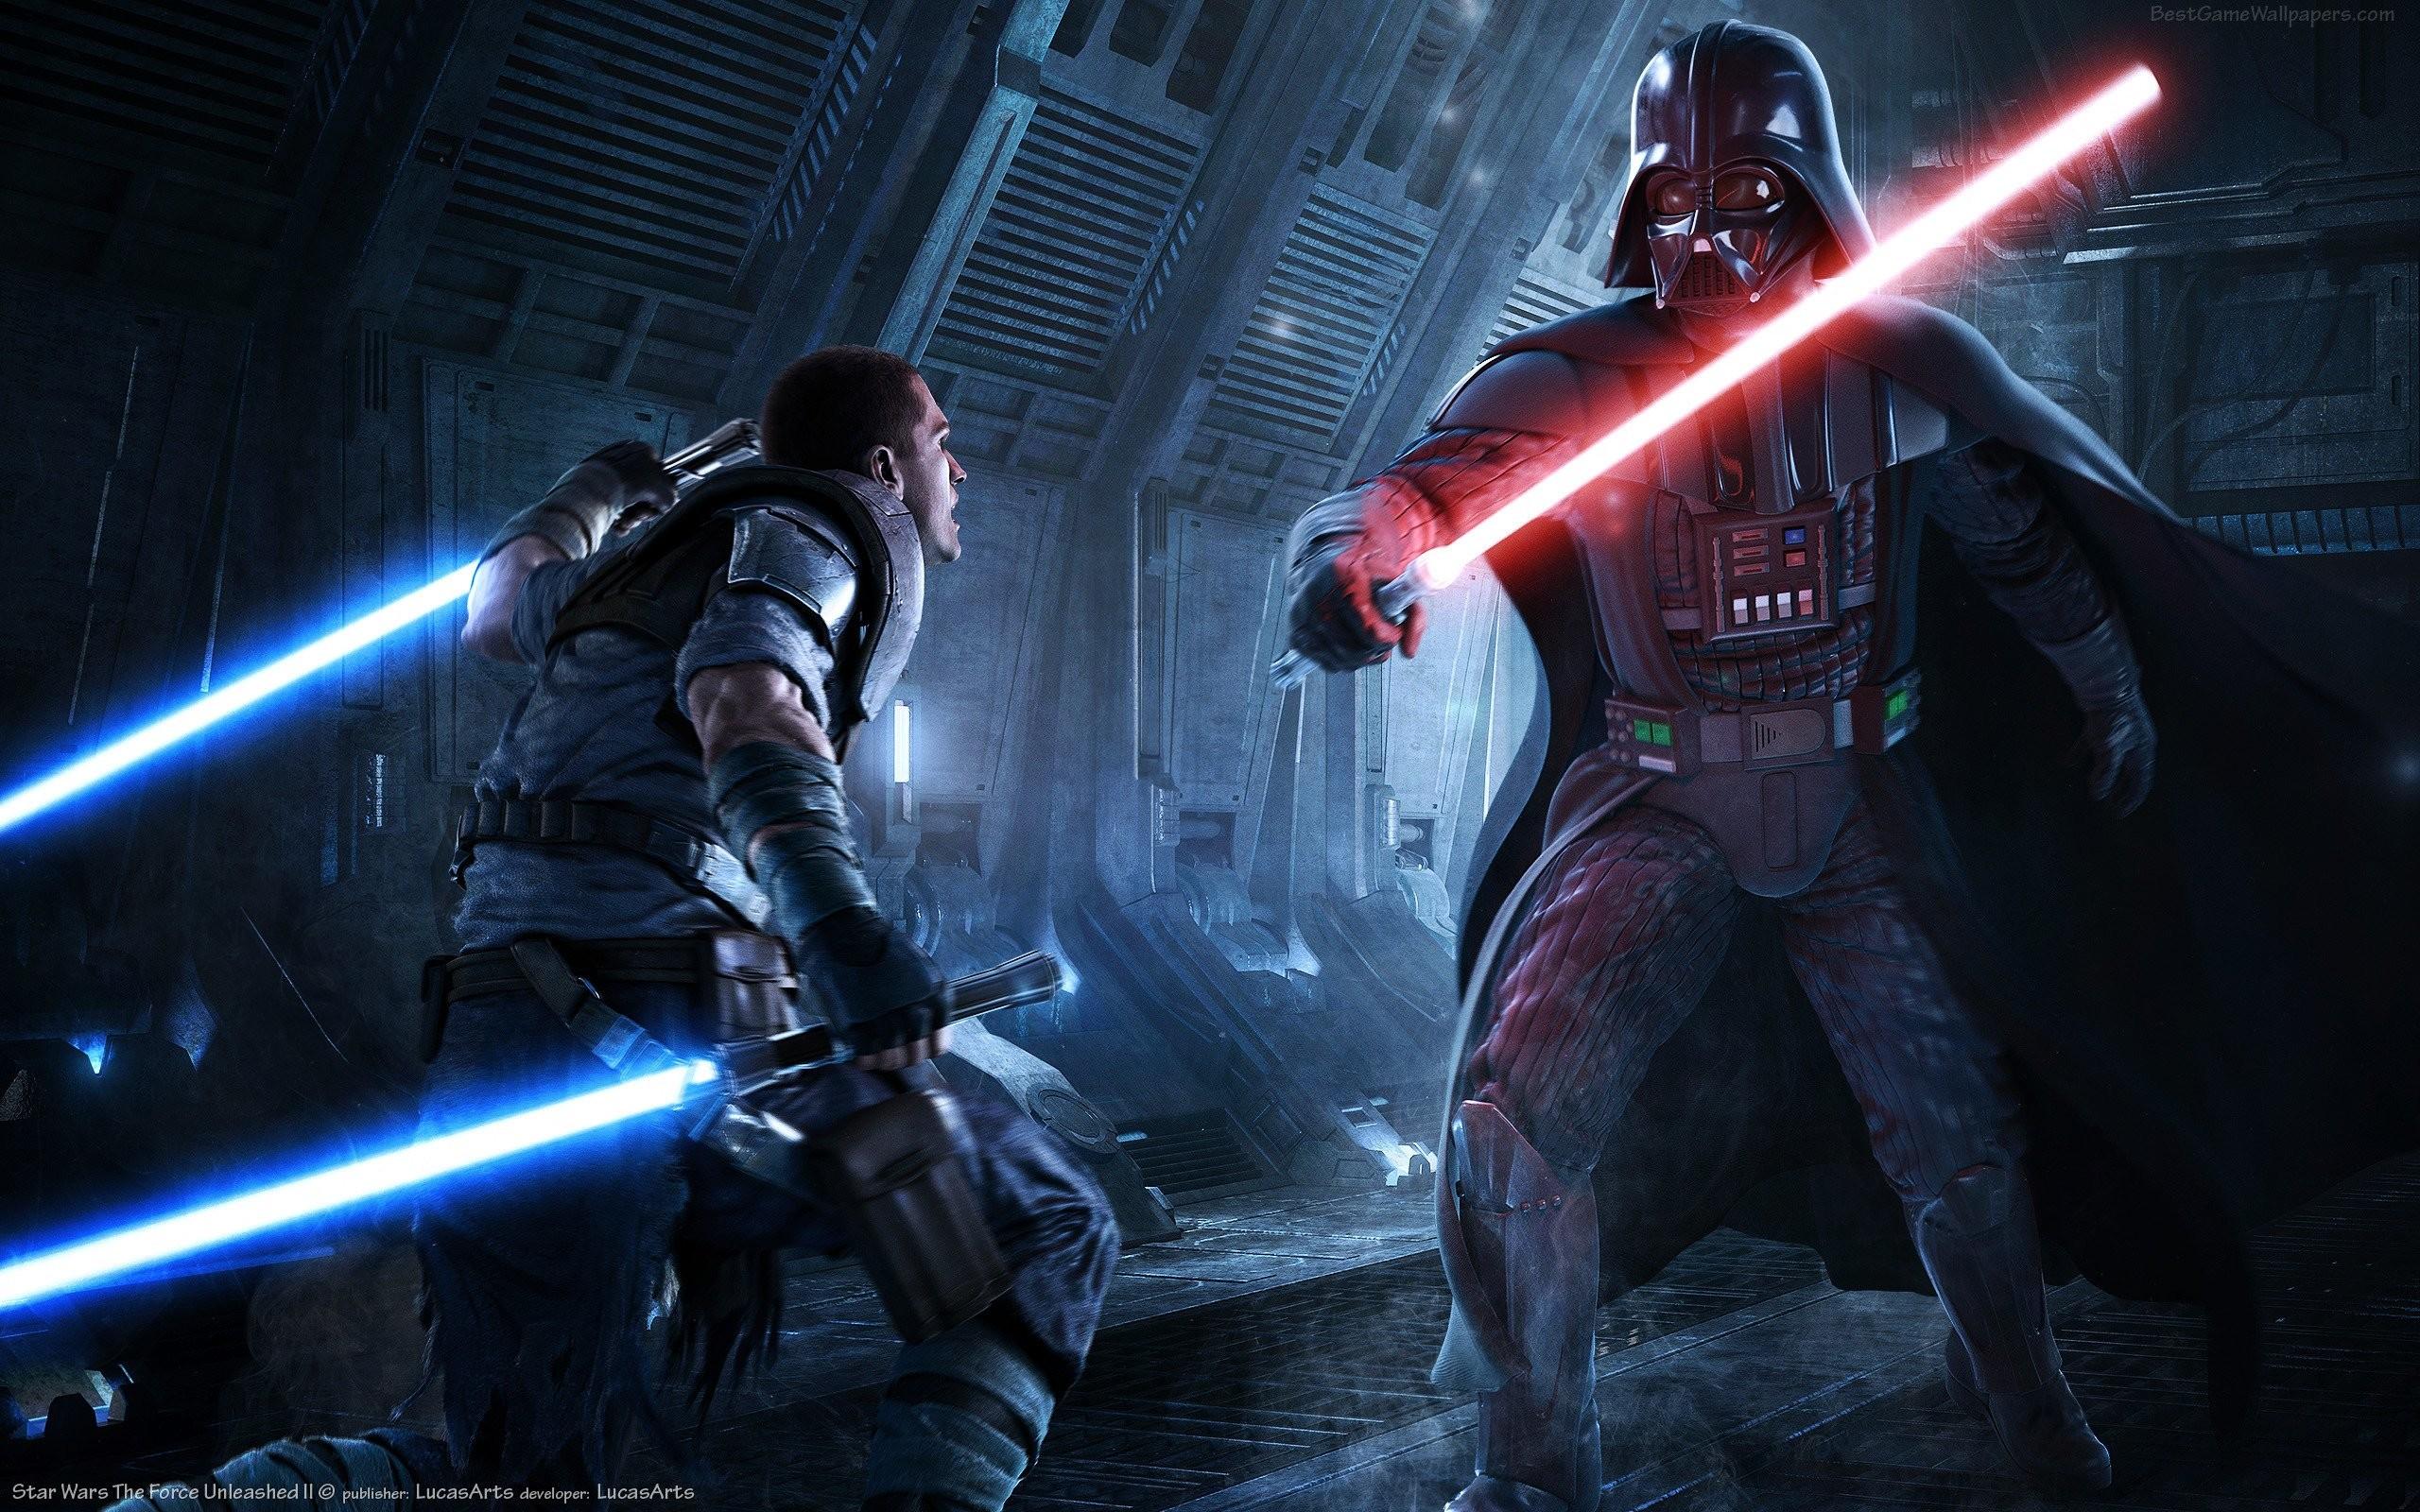 Star Wars Darth Vader Desktop Background Wallpapers : Movie .